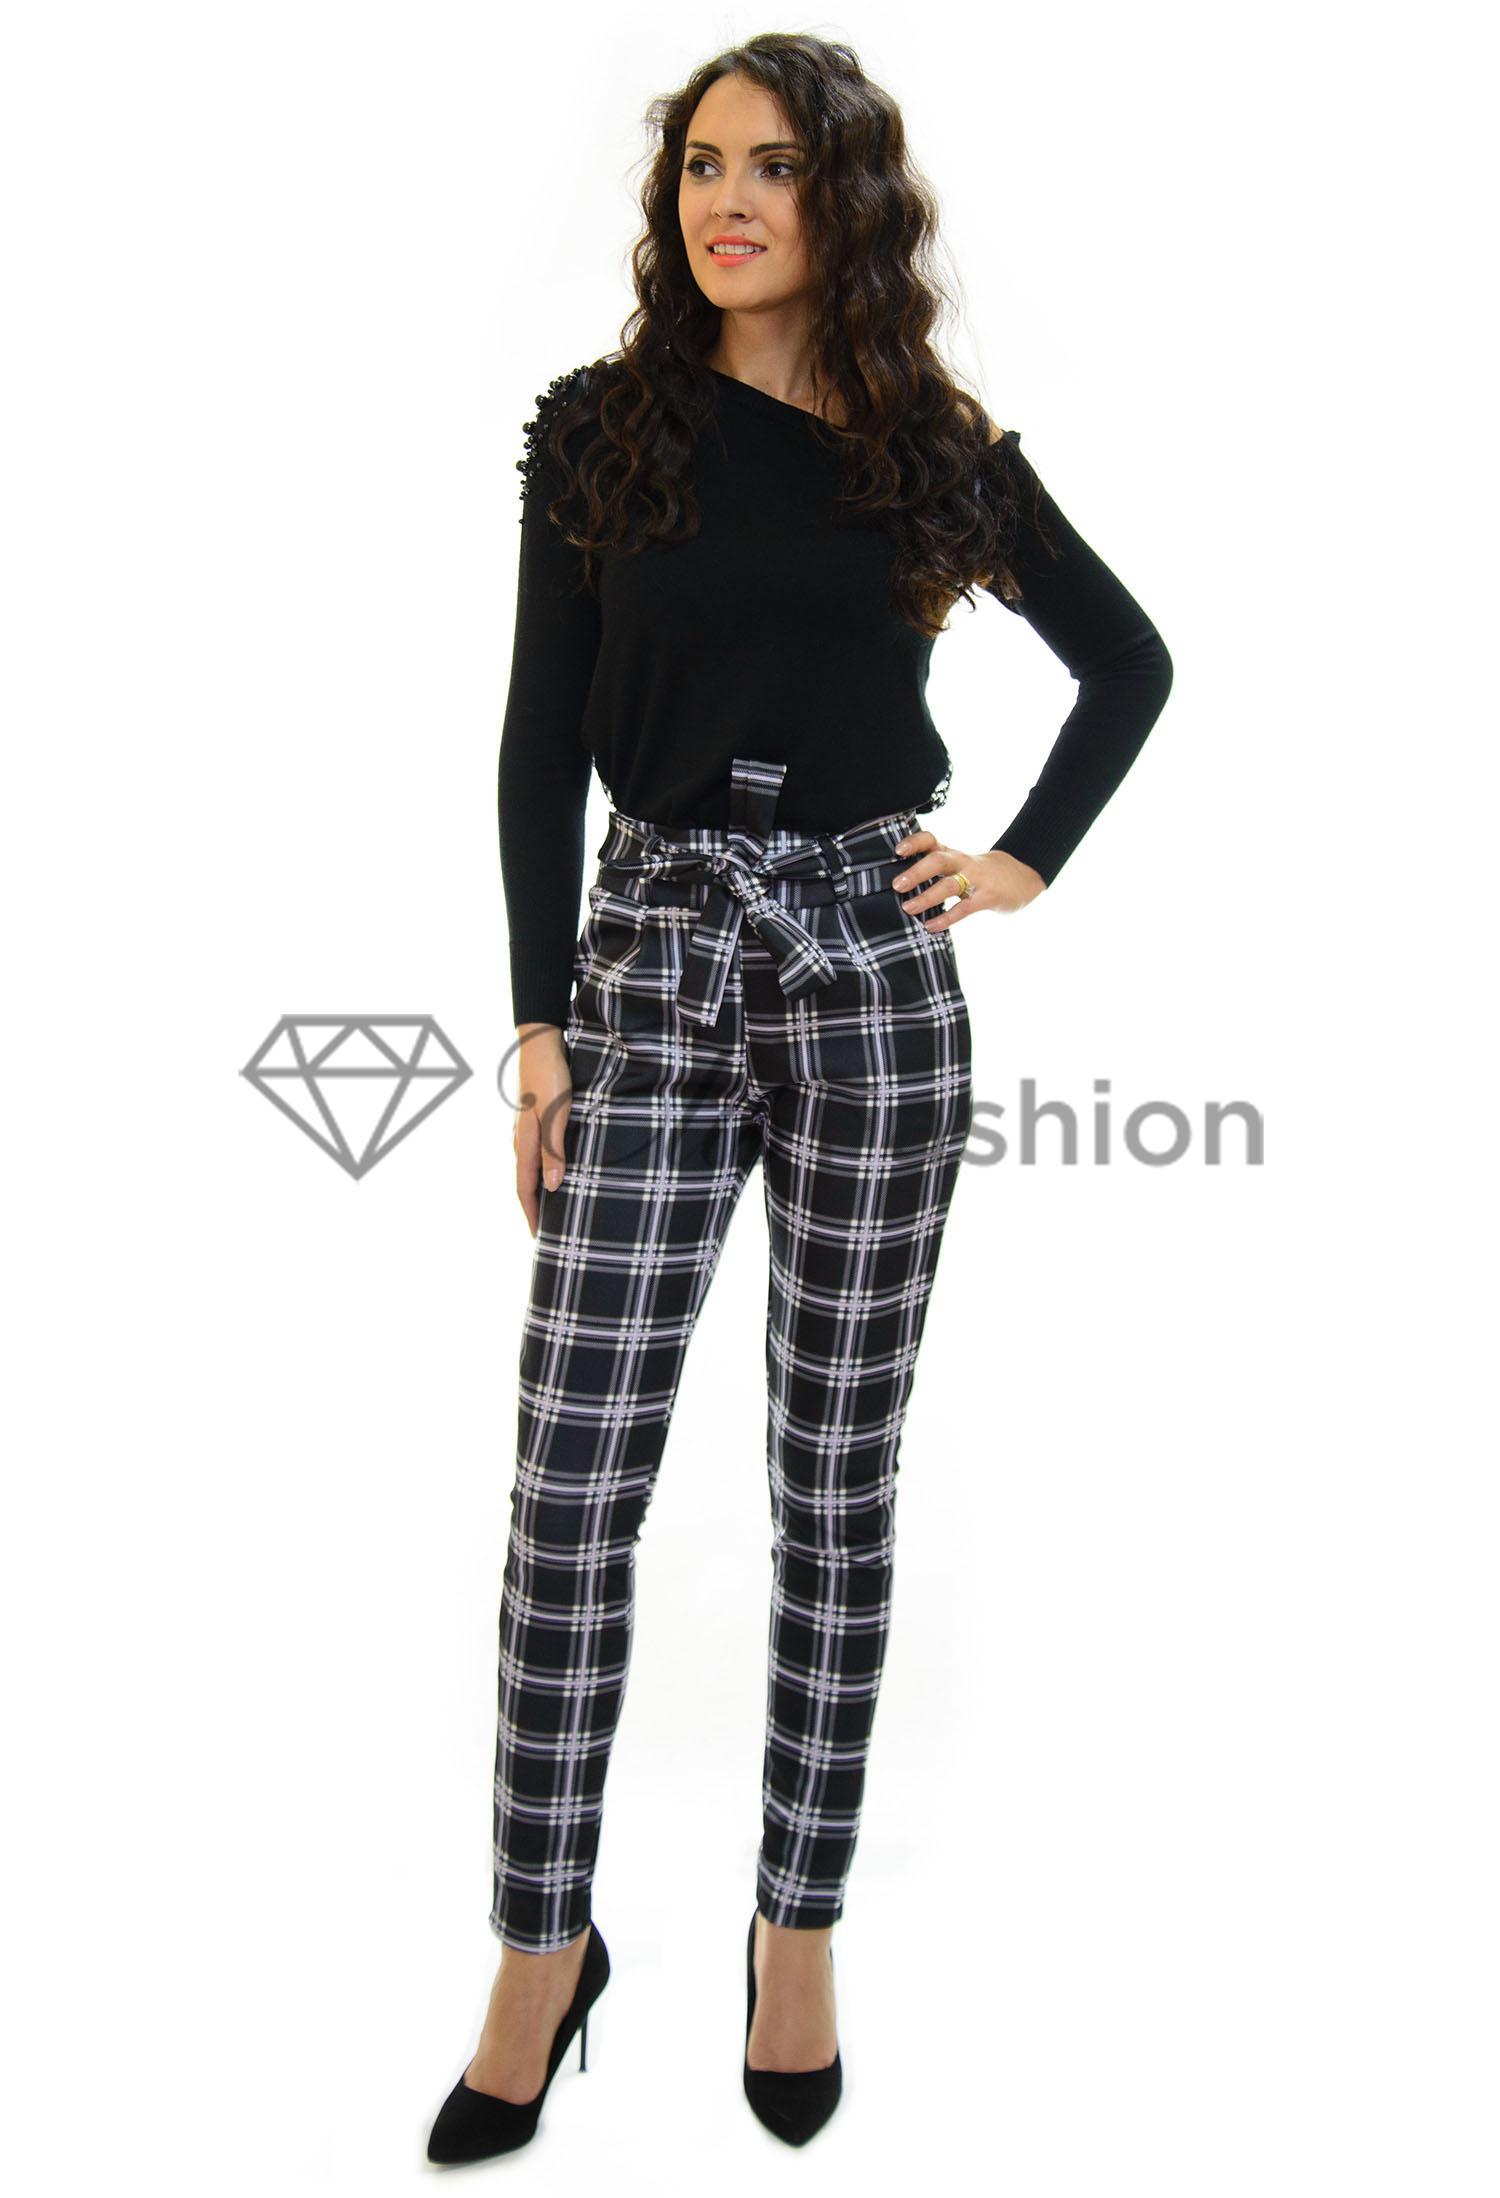 Pantaloni More Craving Black